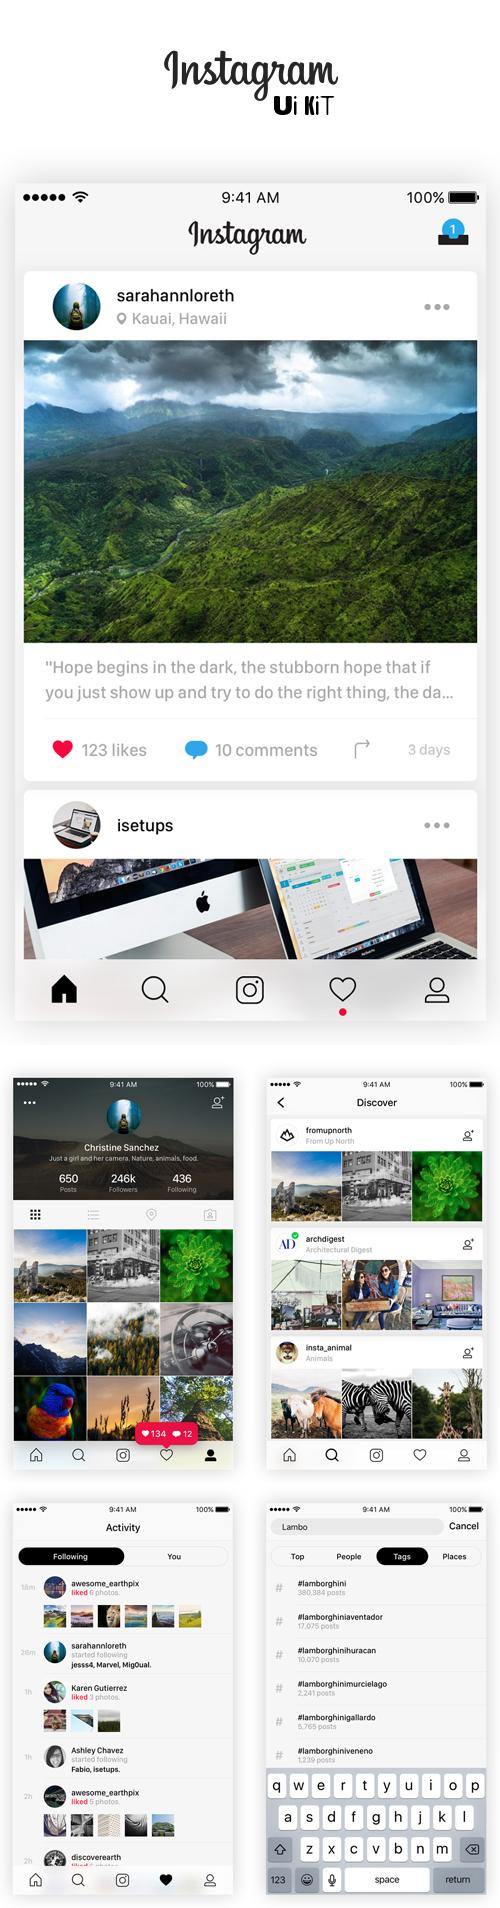 Free Instagram UI Kit